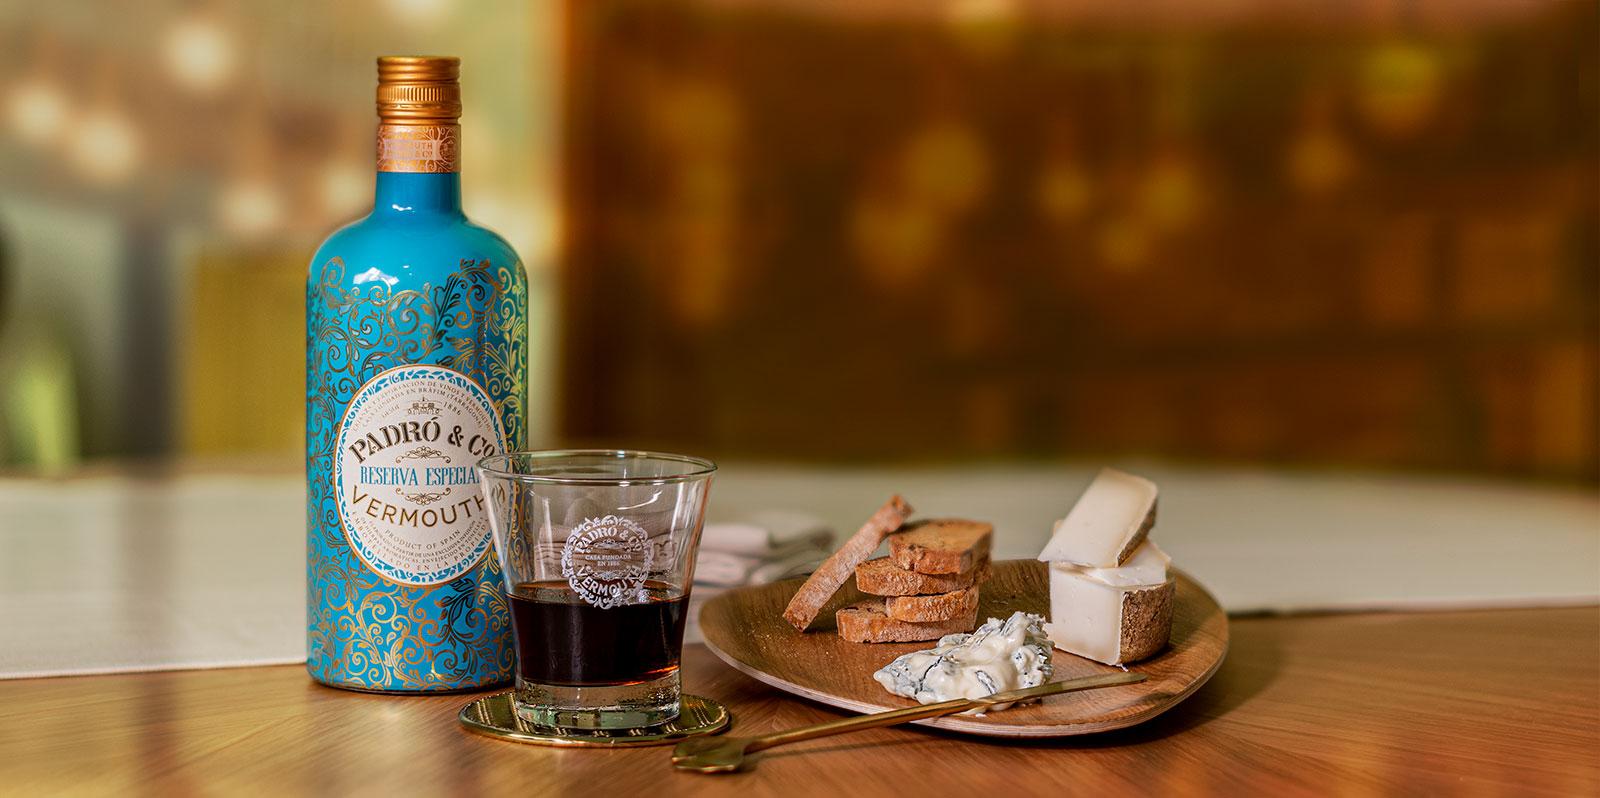 Botella de vermouth Padró con quesos